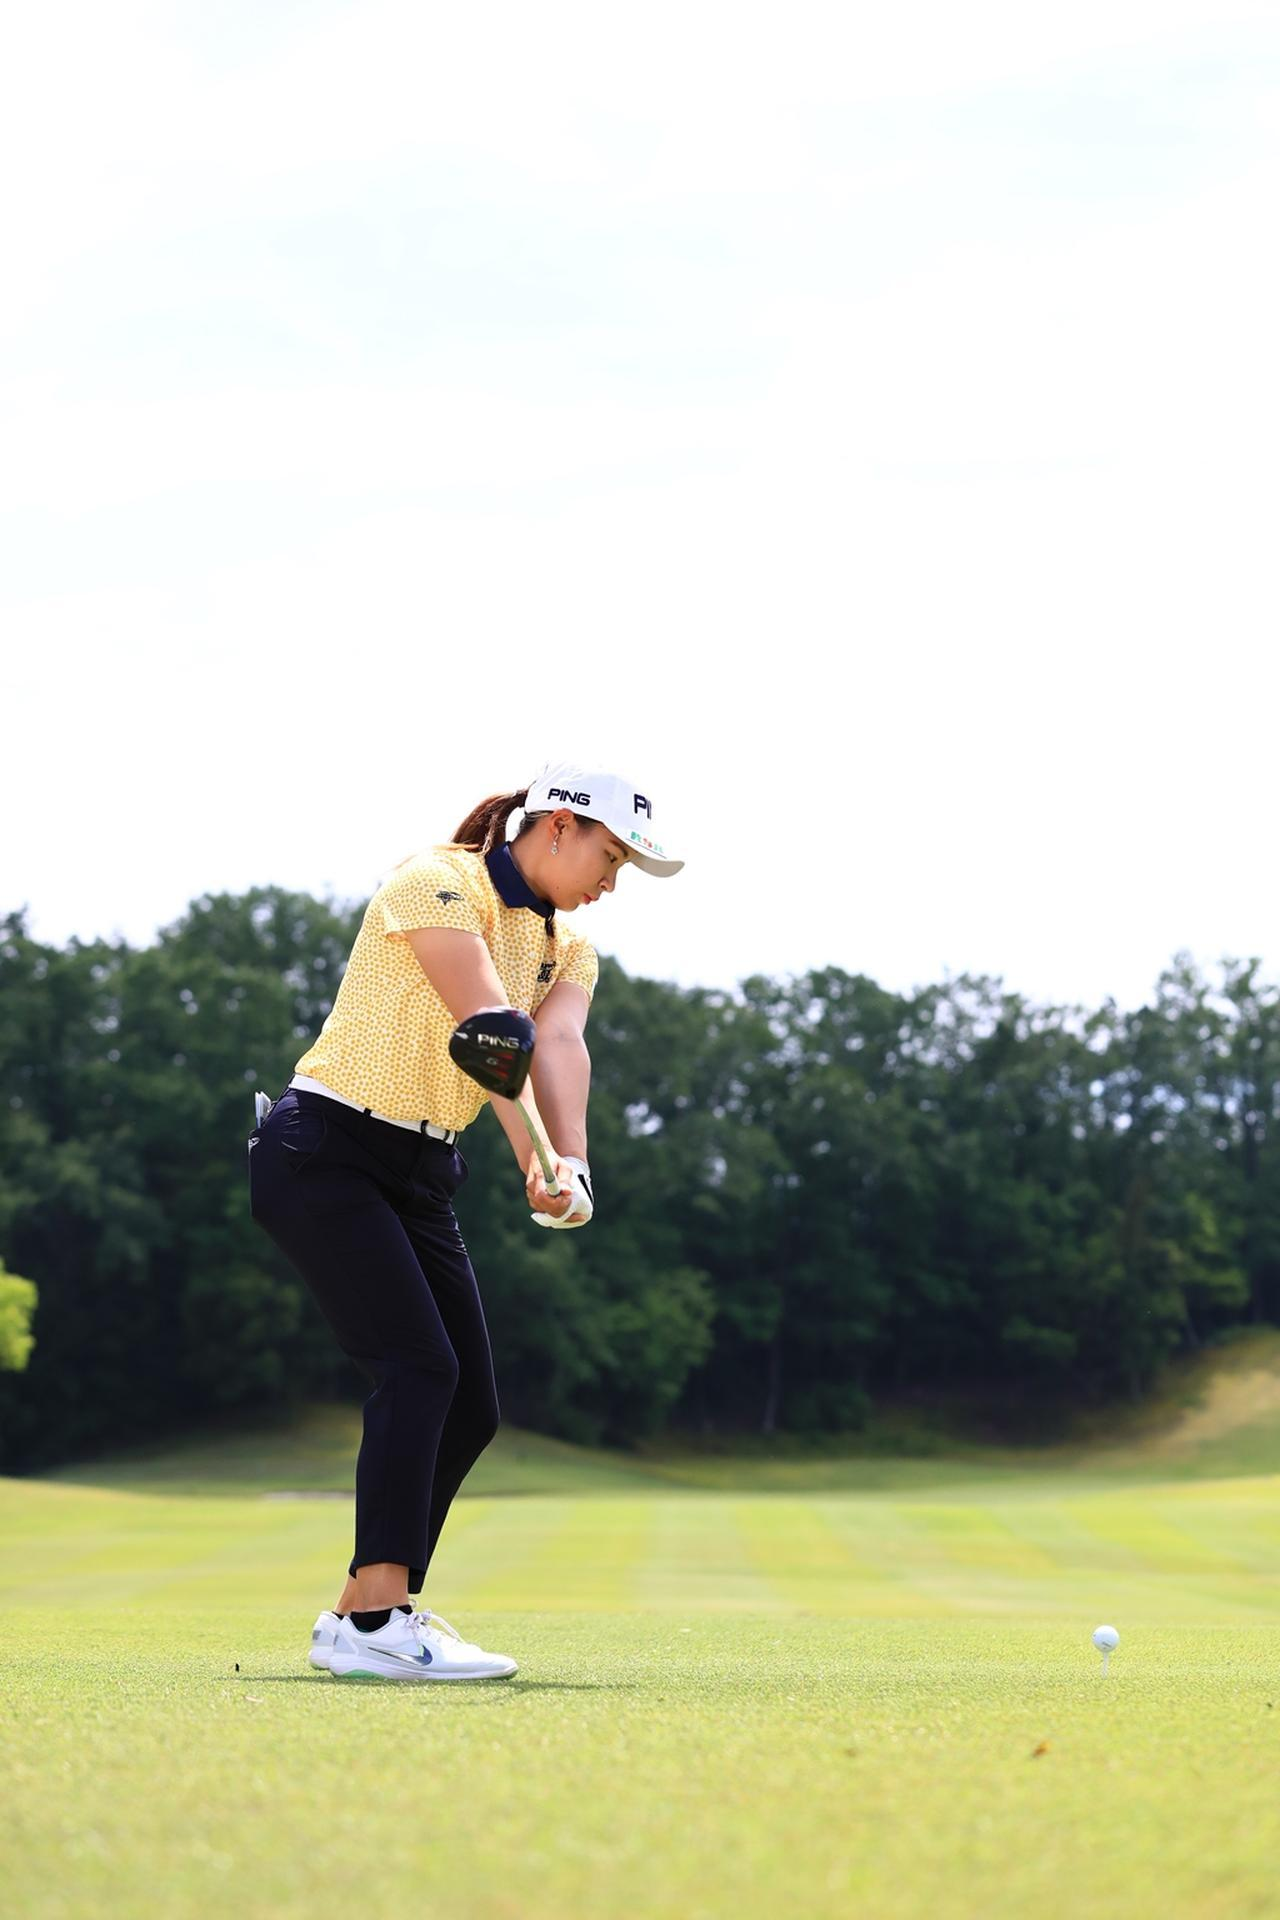 Images : 4番目の画像 - 渋野日向子のドライバー後方連続写真 - みんなのゴルフダイジェスト